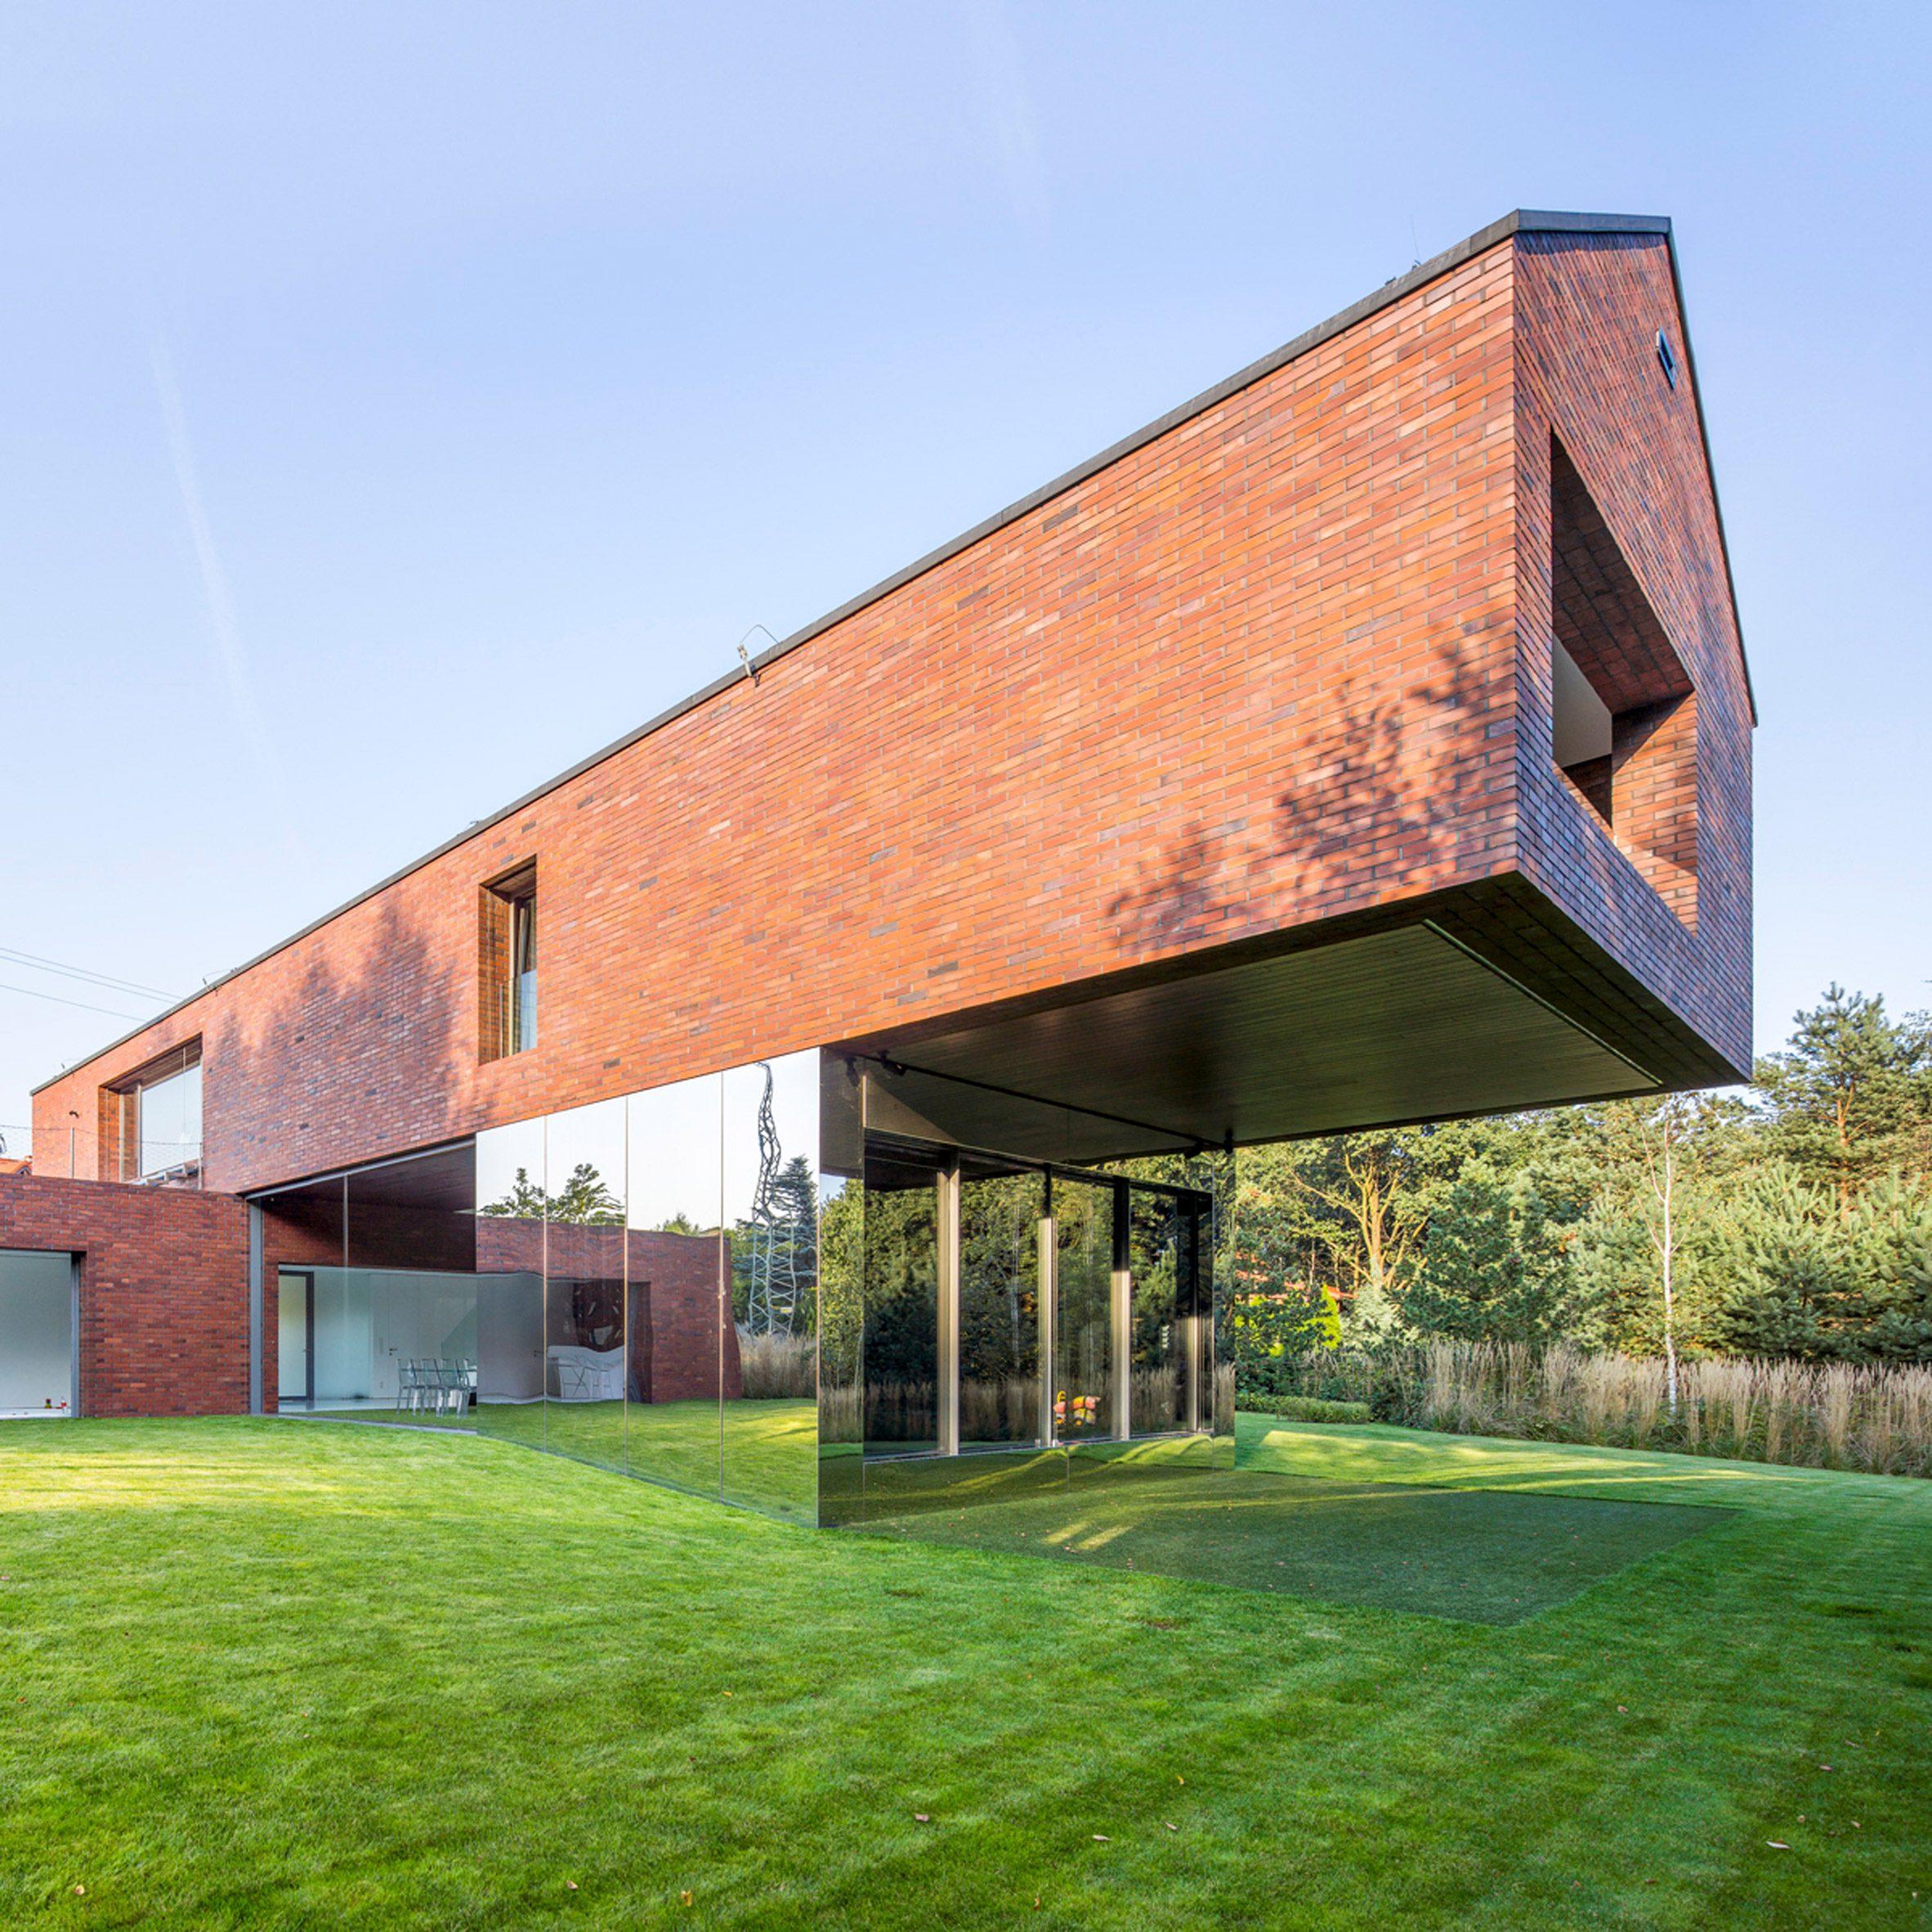 Living-Garden House by architect Robert Konieczny